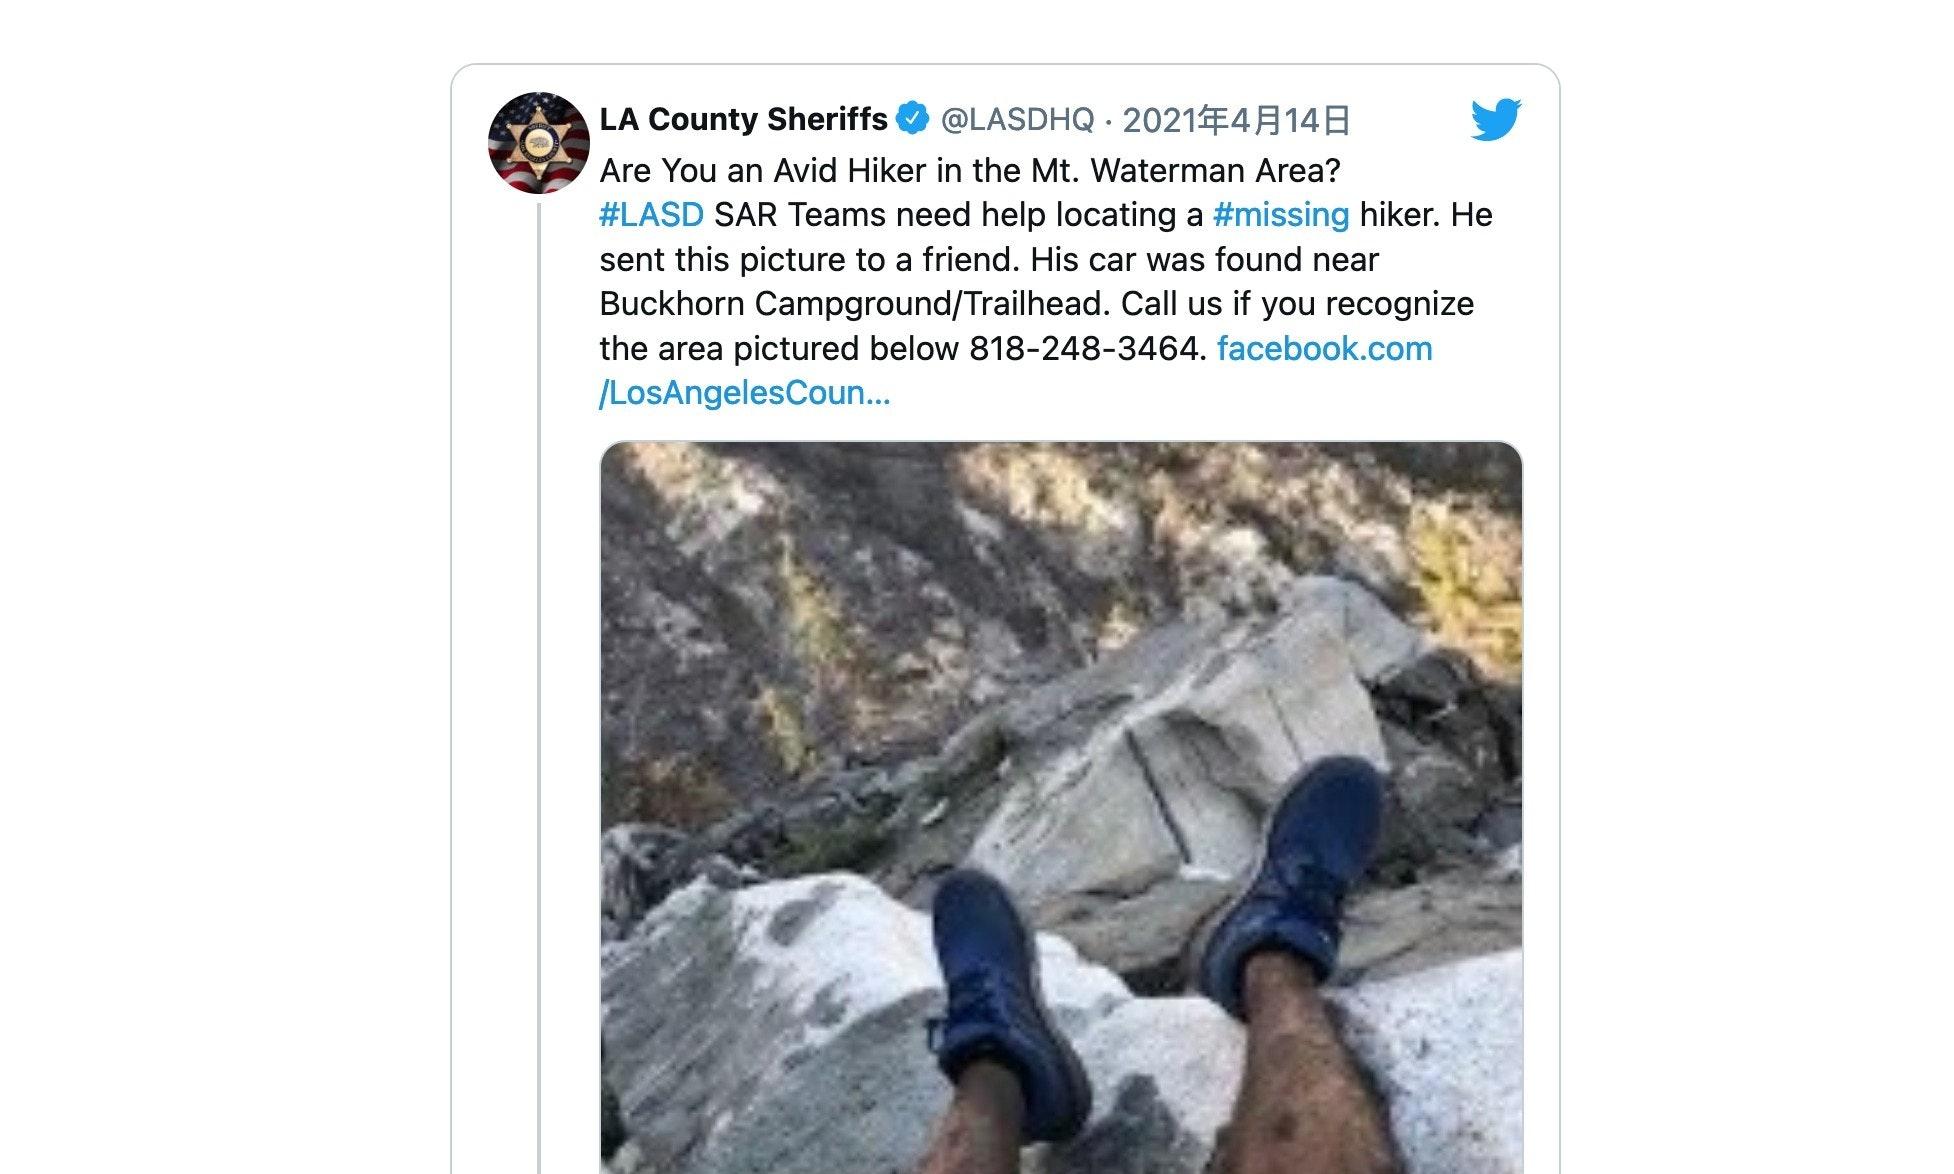 照片中提到了LA County Sheriffs、@LASDHQ · 2021#414A、Are You an Avid Hiker in the Mt. Waterman Area?,包含了失踪的徒步旅行者、沃特曼山滑雪纜車、健行、聖蓋博山脈、開拓者